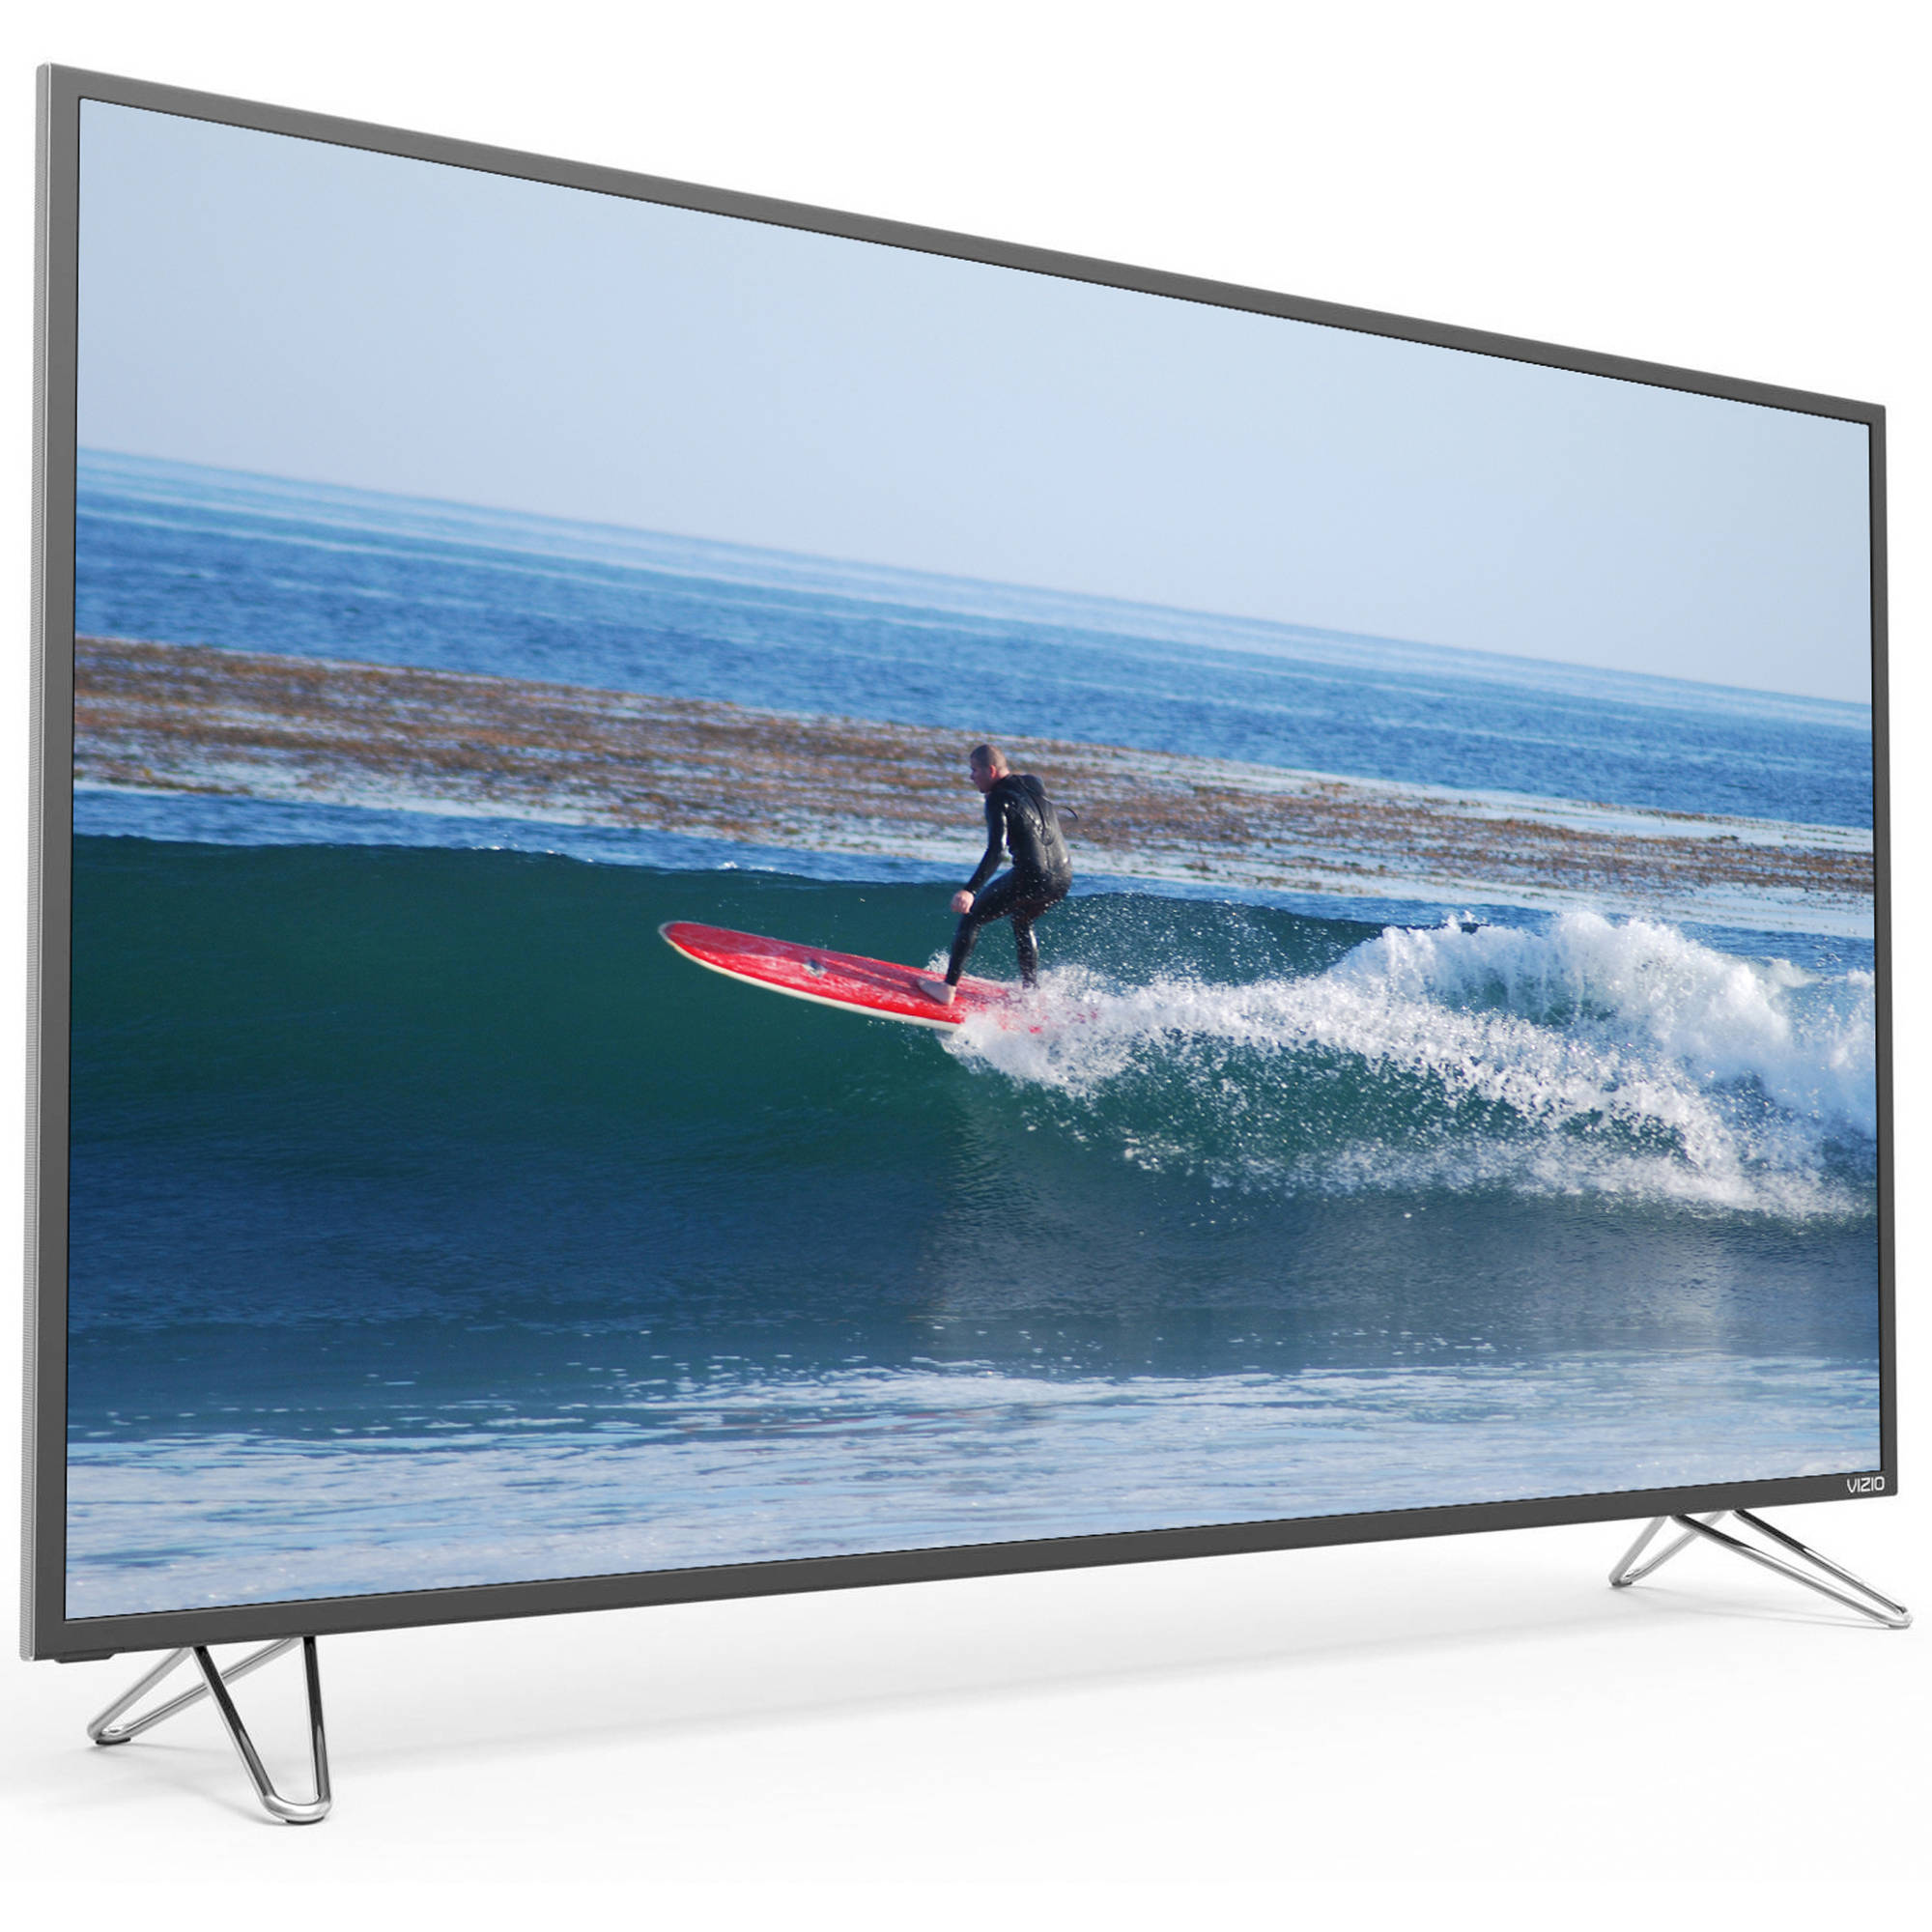 Refurbished VIZIO SmartCast 55 Class M - Series  -  4K Ultra HD, Smart, LED Home Theater Display  -  2160p, 120Hz (M55 - D0)